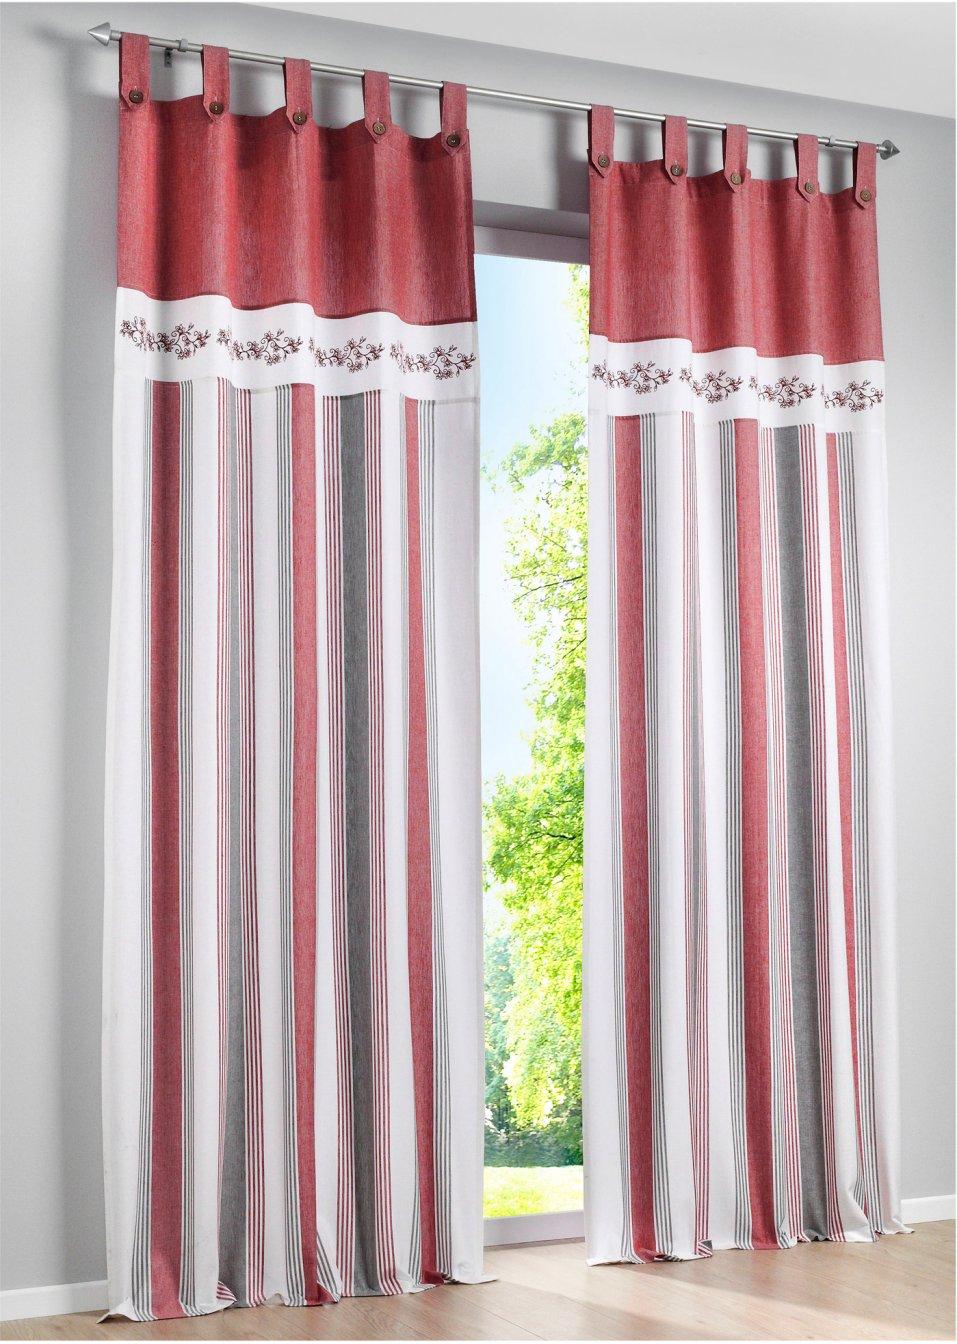 Tenda nora pacco da 1 rosso bpc living ordina online for Bonprix online shop gardinen